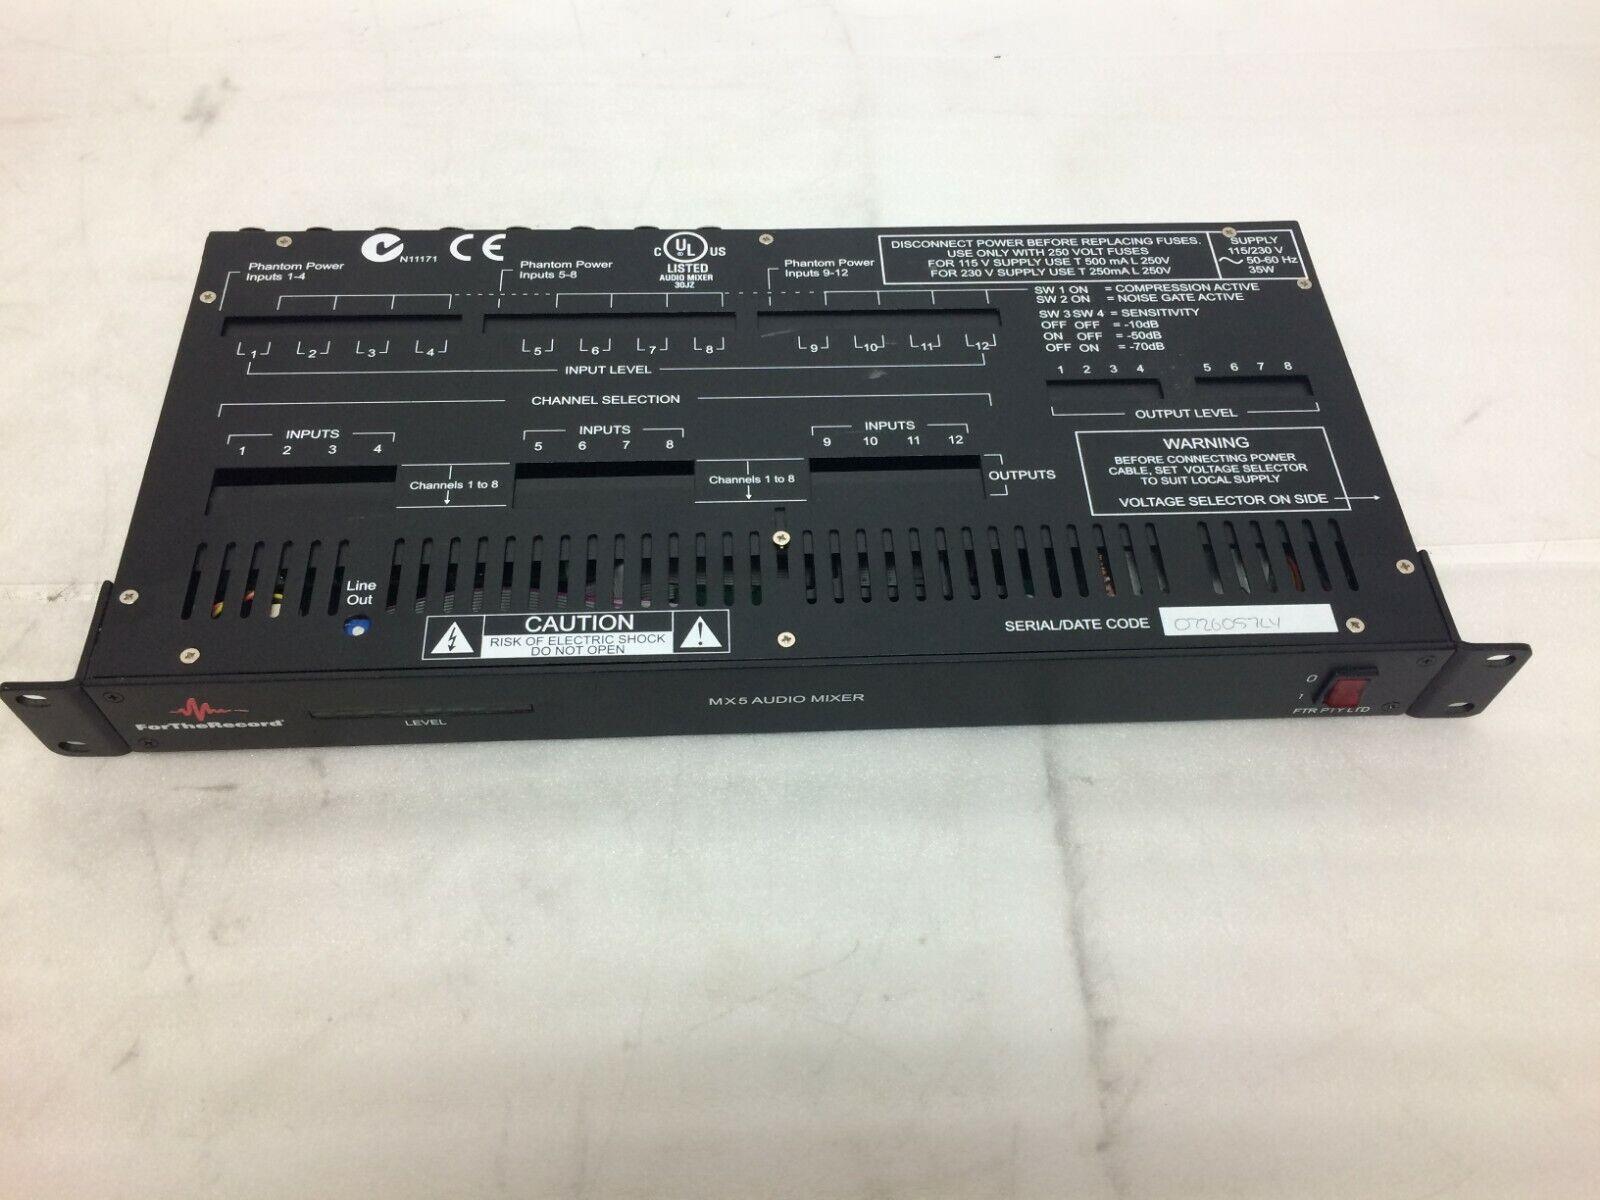 For the Record MX5 Audio Mixer 115/230V 50-60 Hz 35W